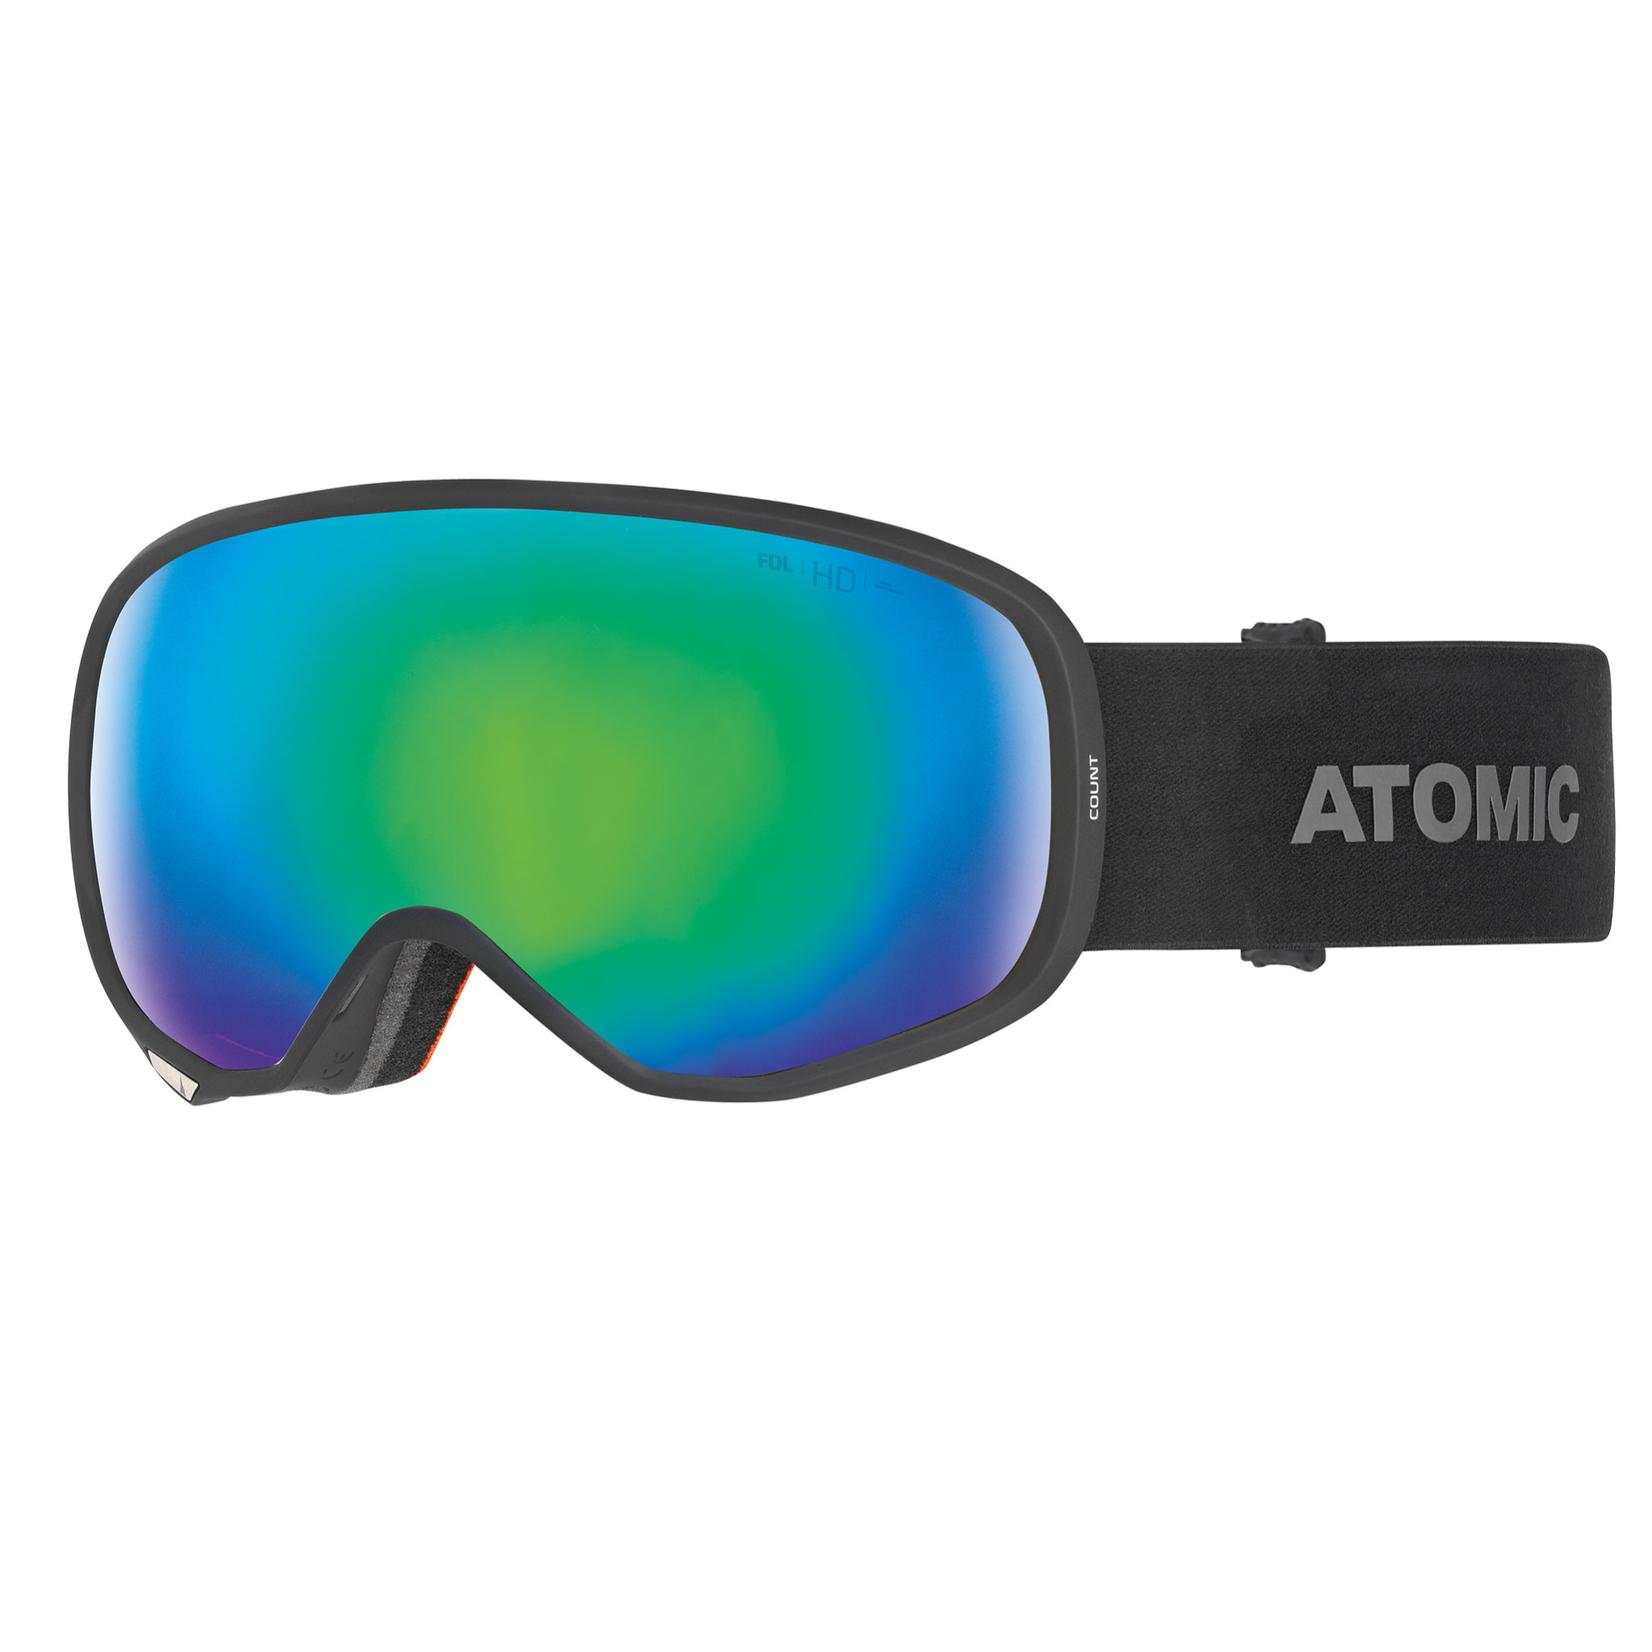 Atomic Atomic Count S 360 Goggle - Unisex